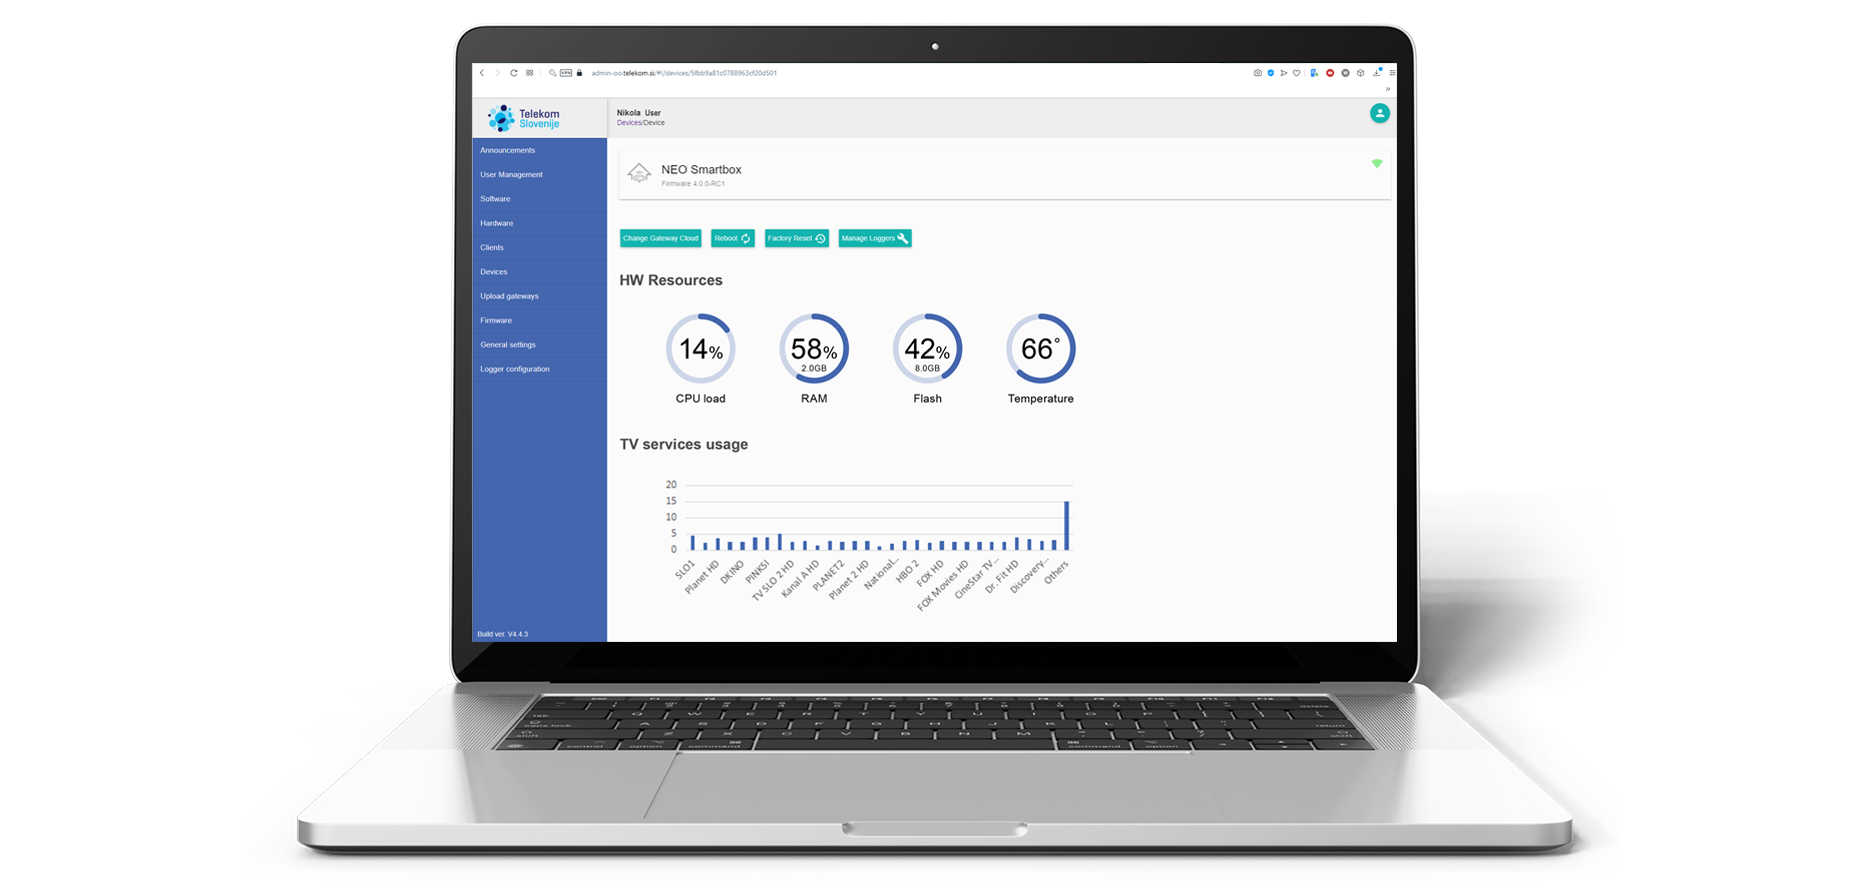 oblo remote configuration and monitoring dashboard application iot smart